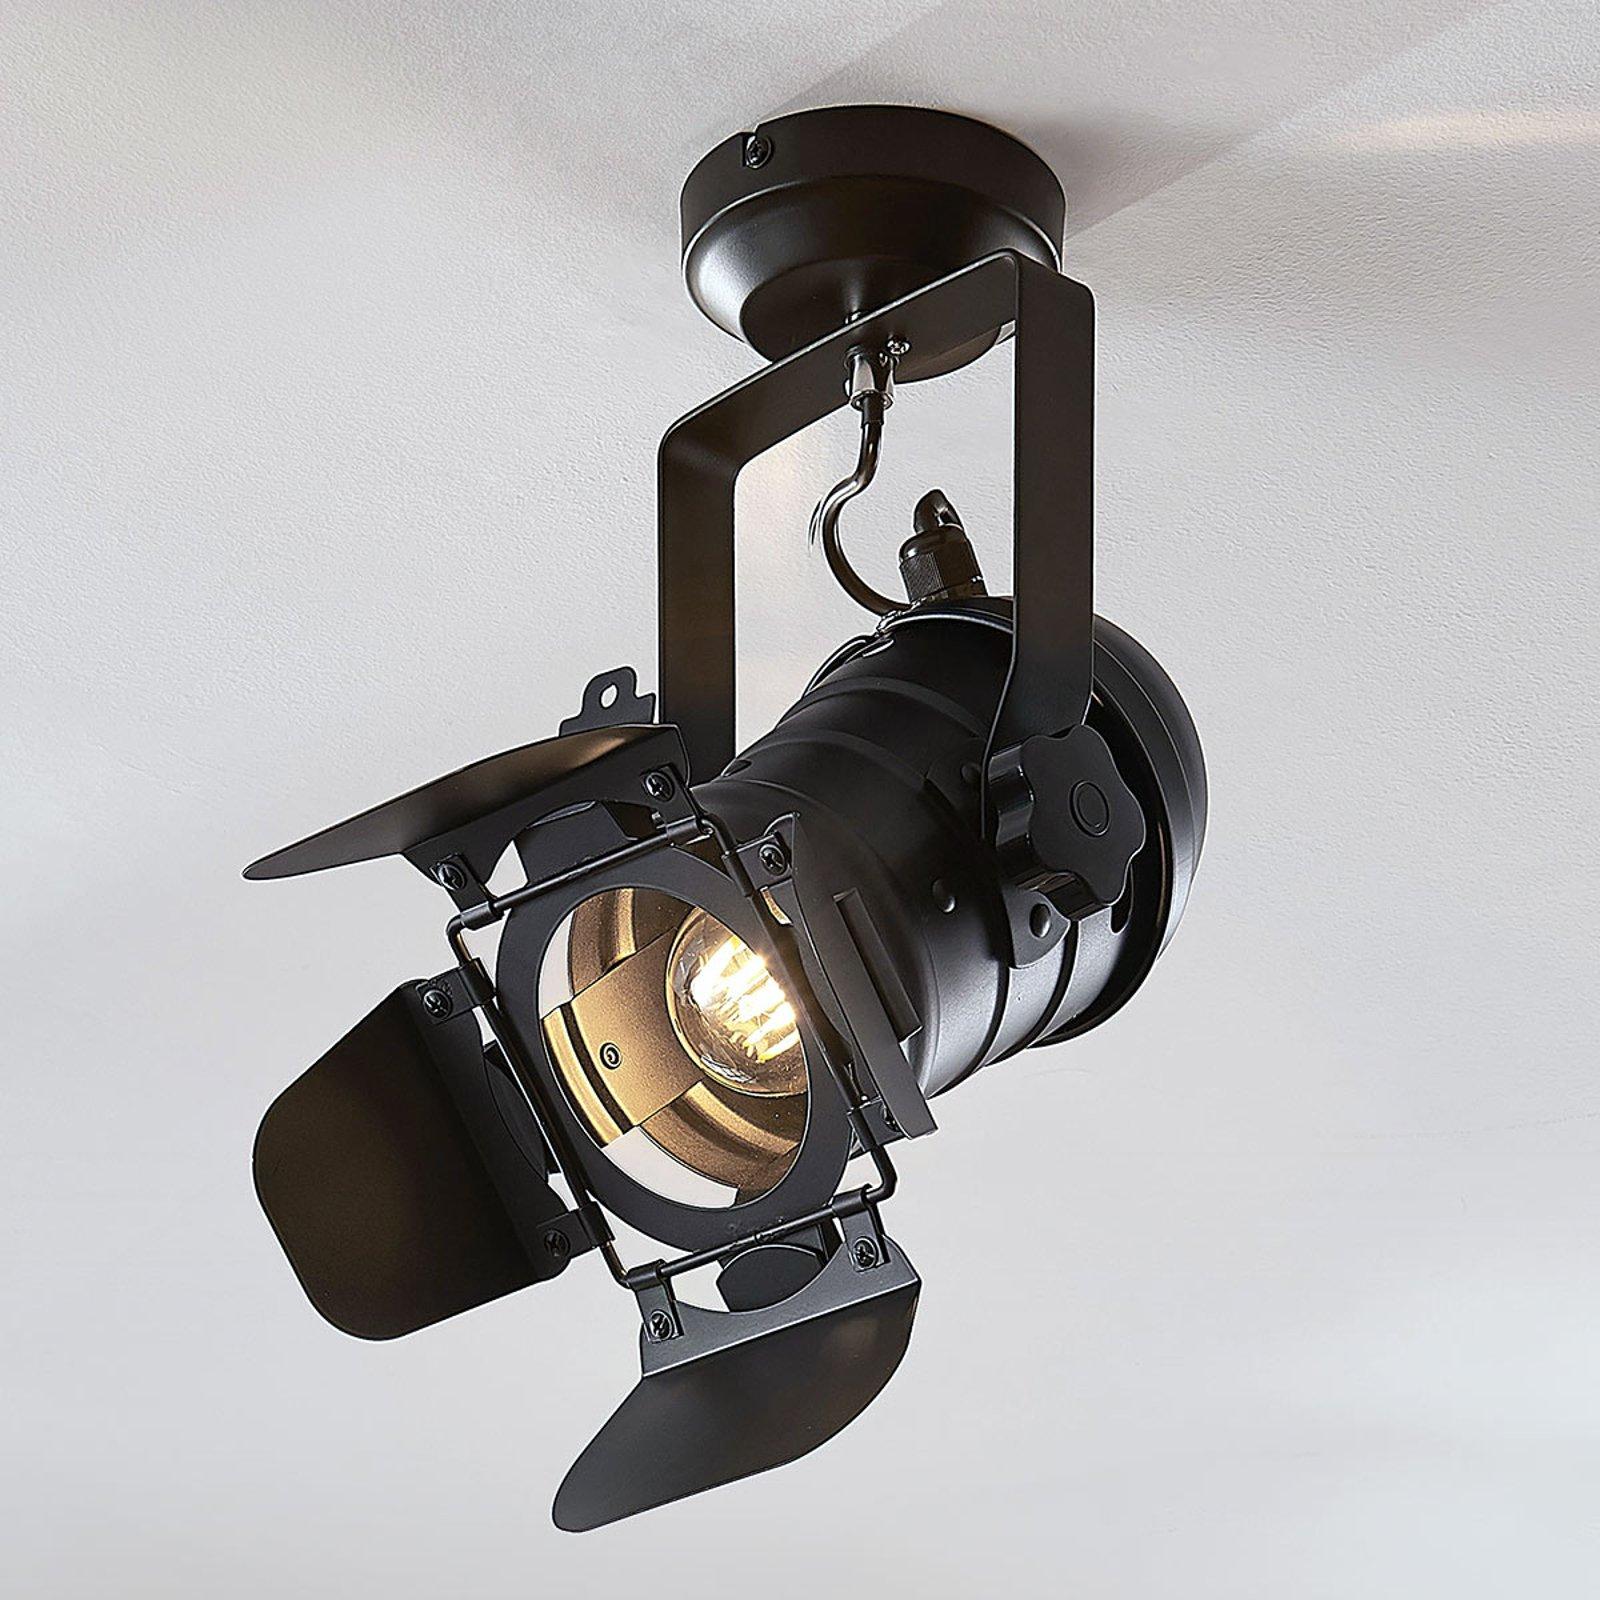 Taklampe Tilen, 1 lyskilder, lyskasterdesign